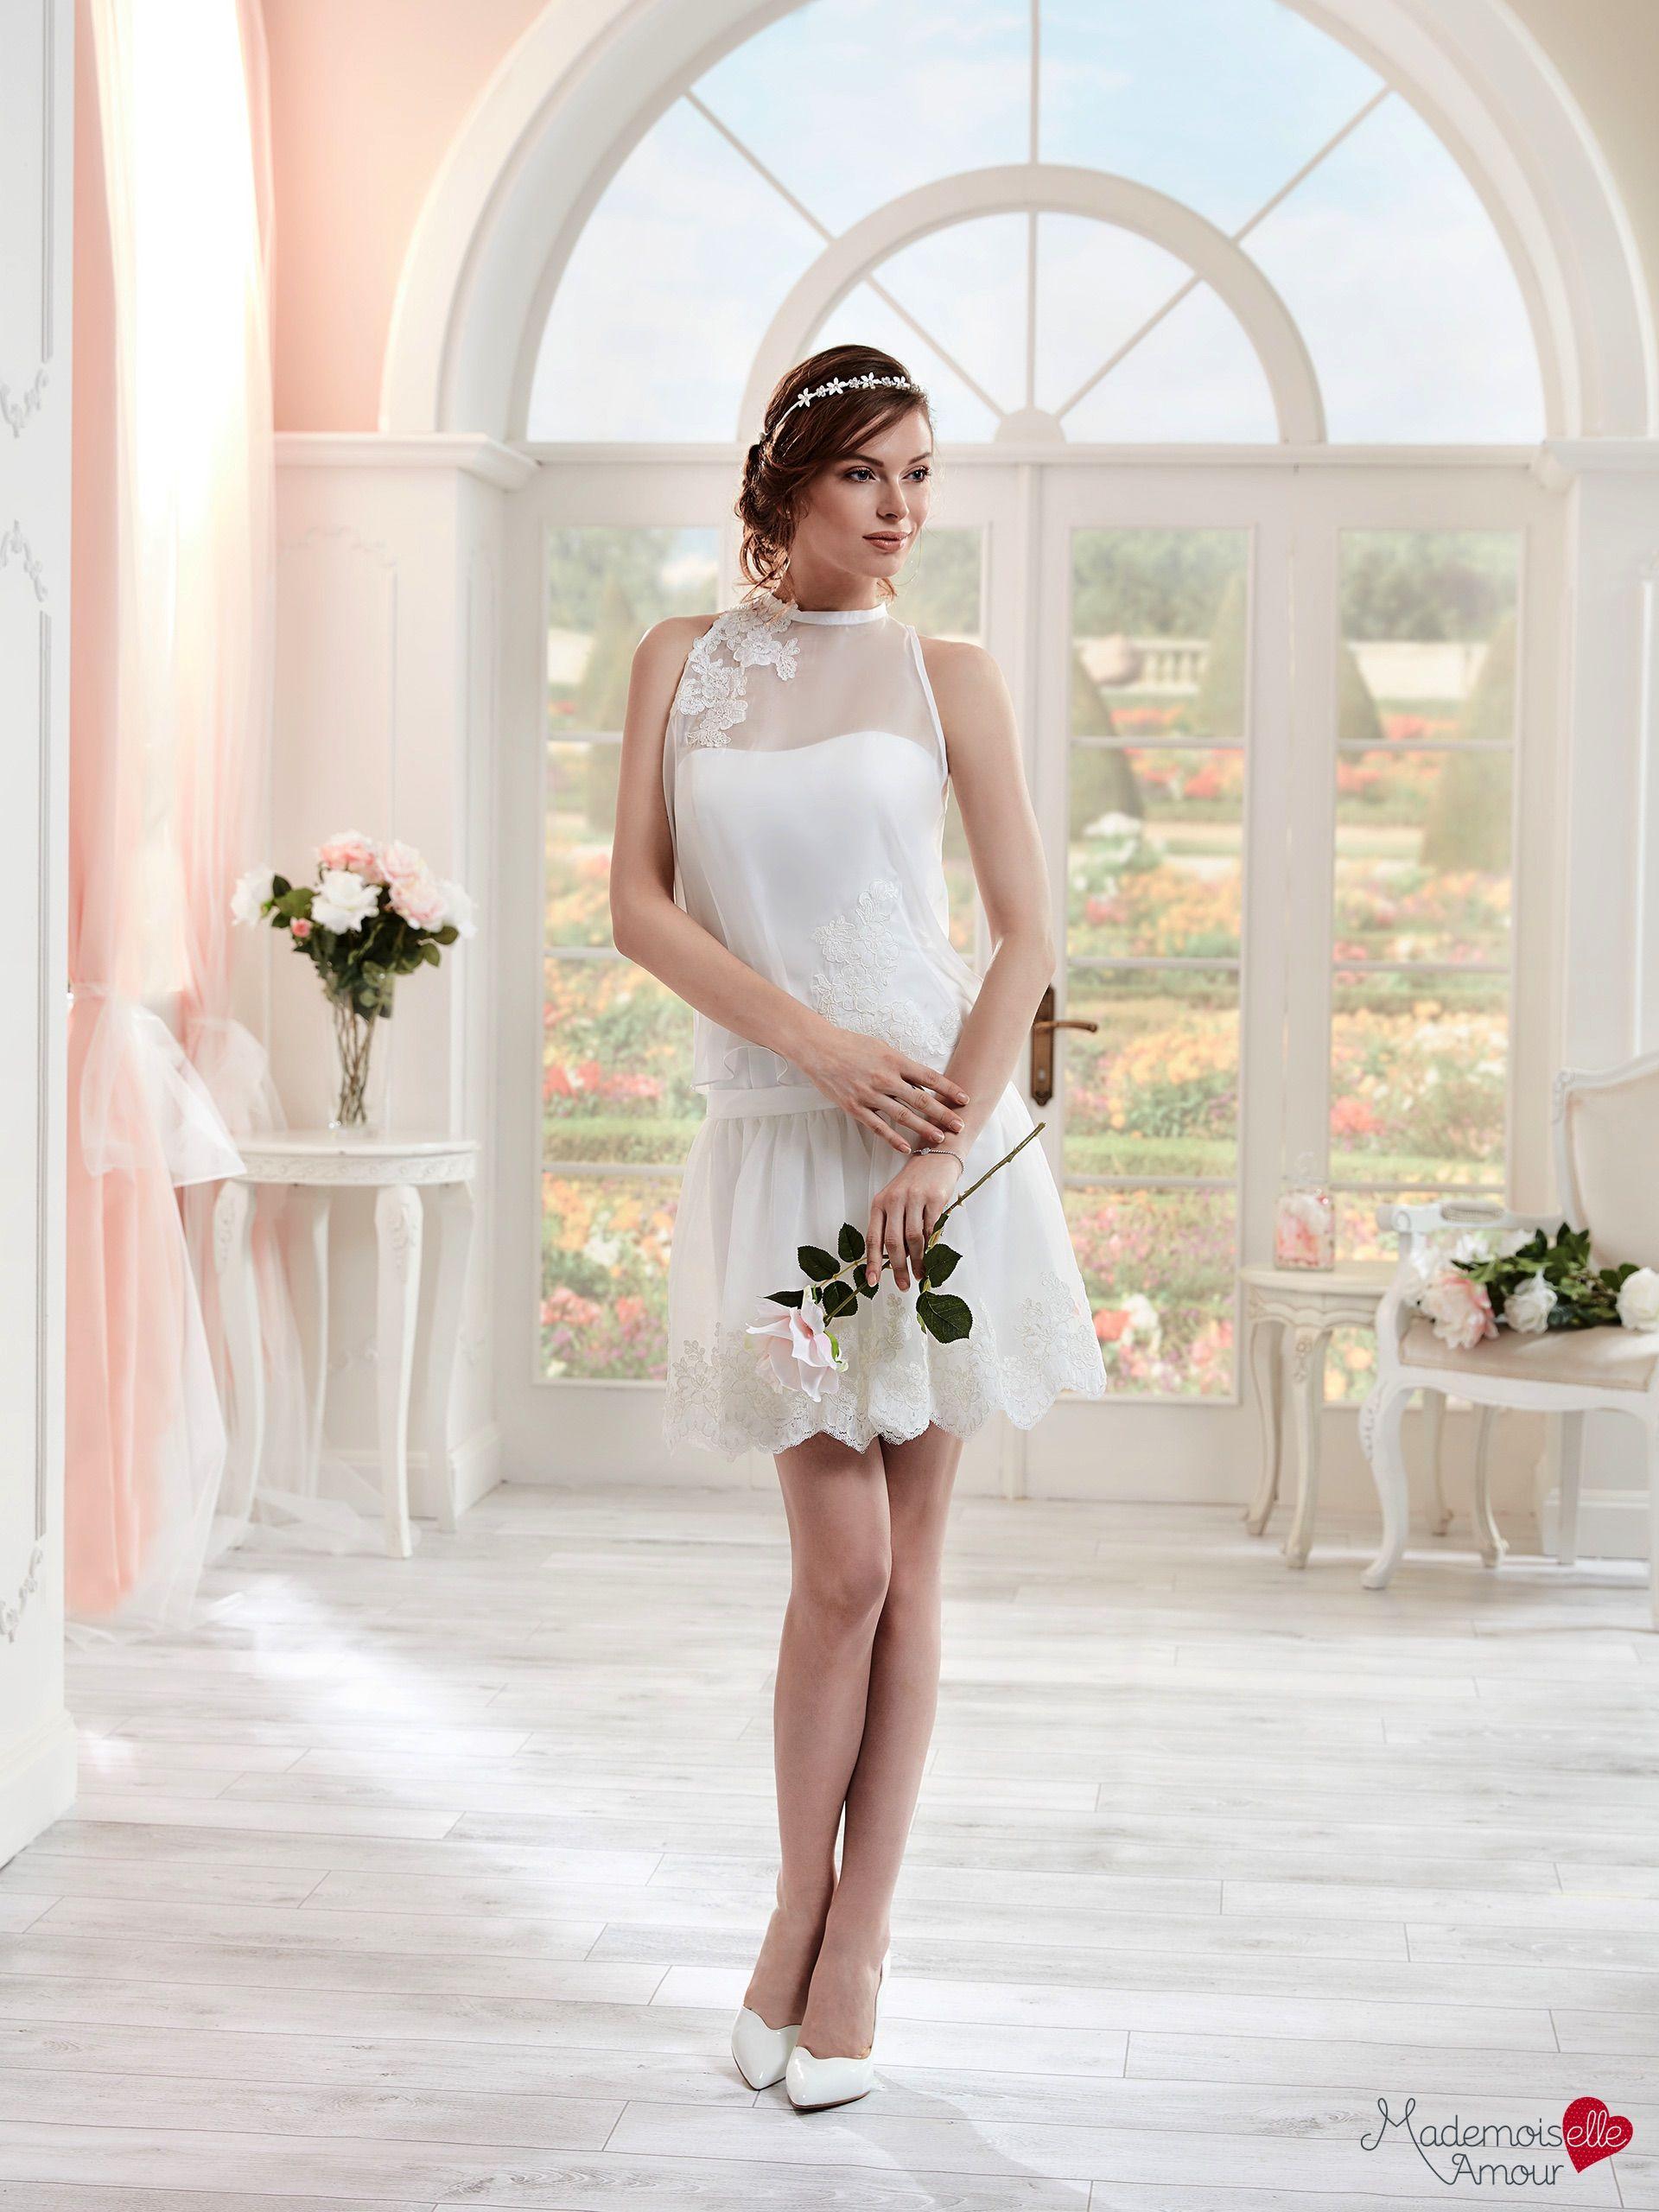 Robe mariée Mlle Alicia, robe de mariée courte, robe de mariage effet  blouse\u2026